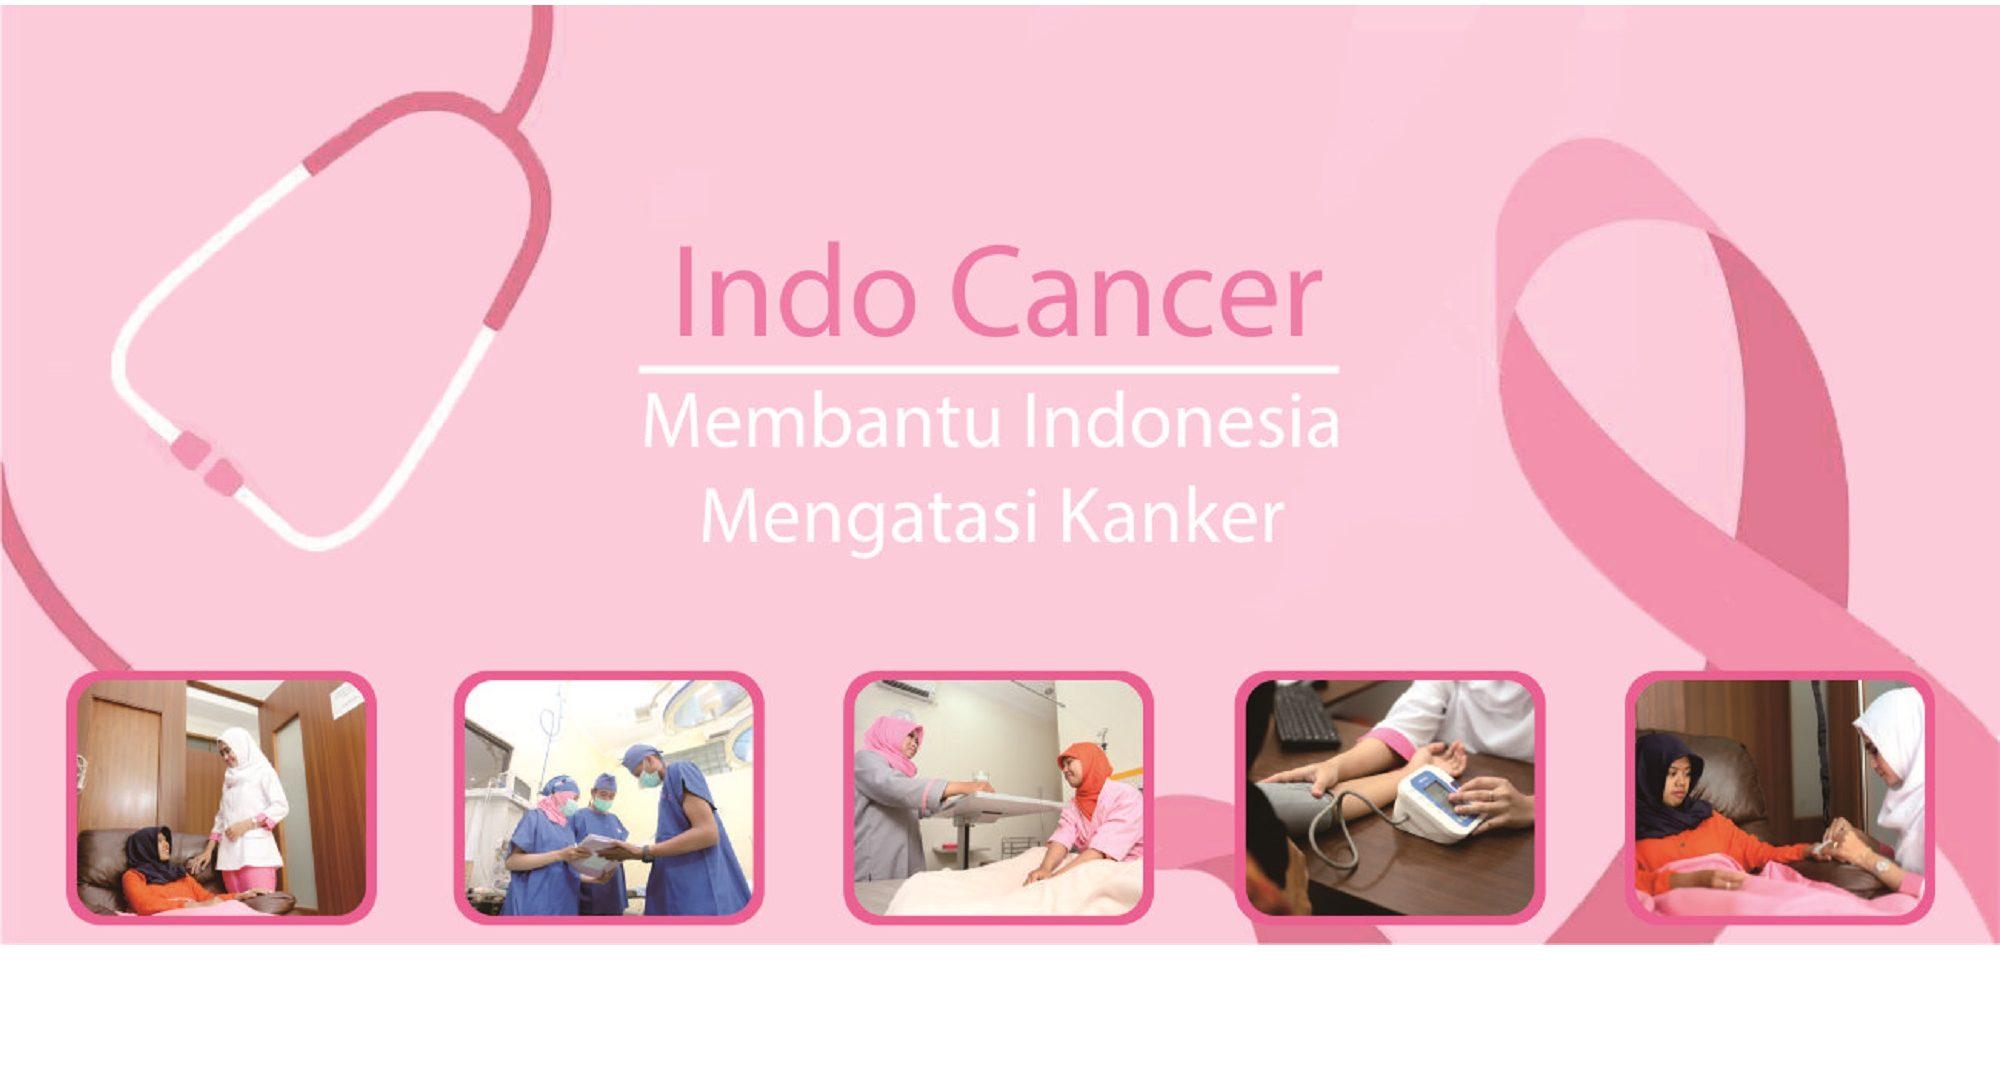 Indo Cancer